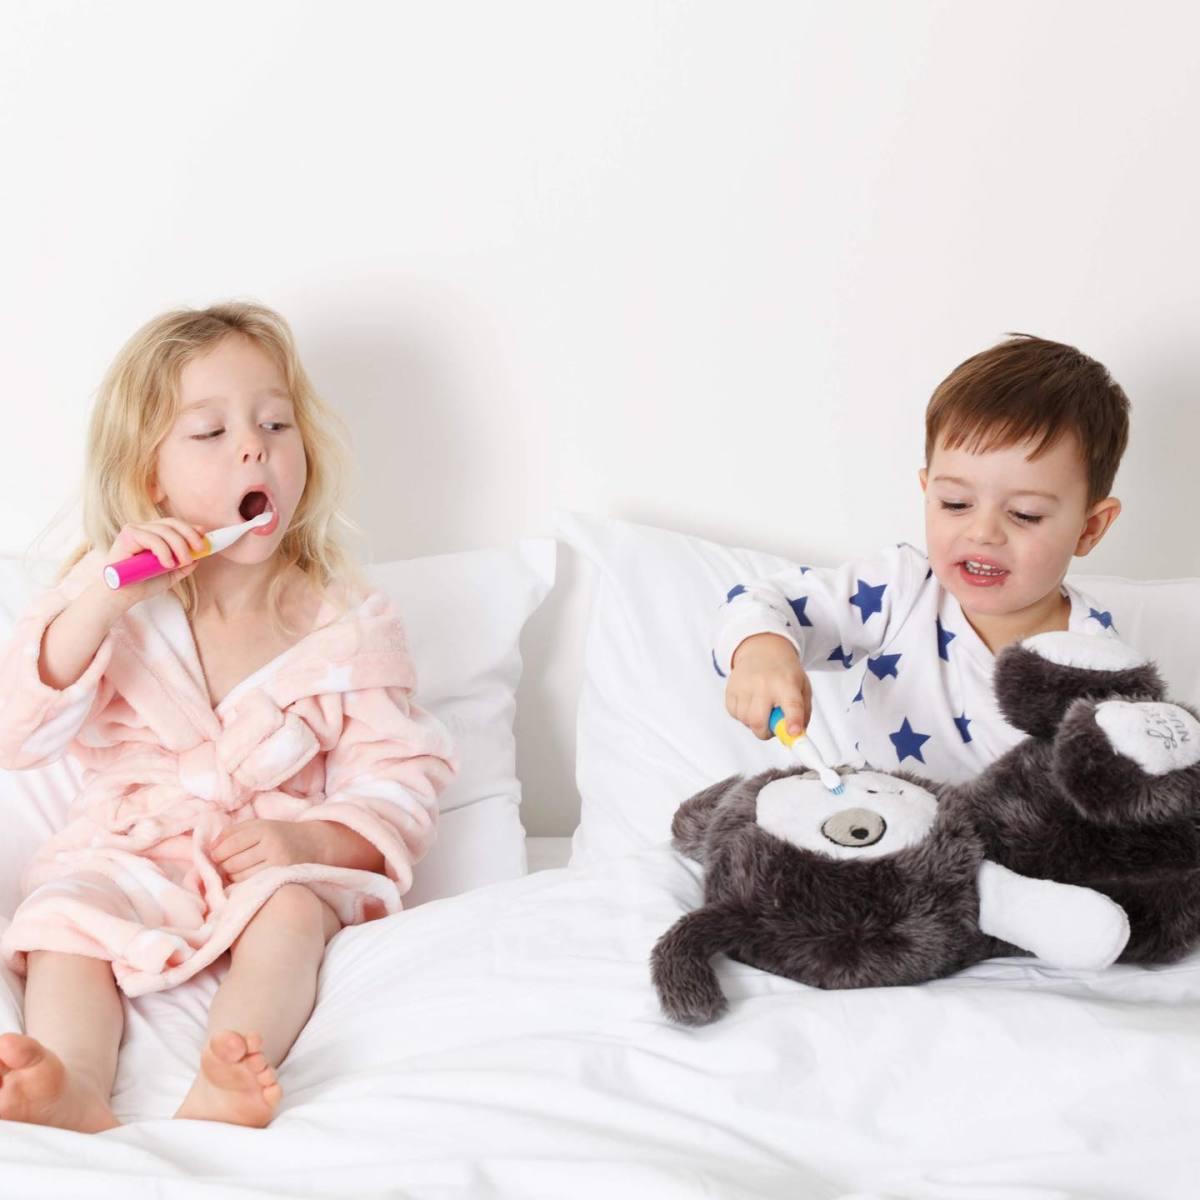 babies-children-how-to-make-tooth-brushing-fun